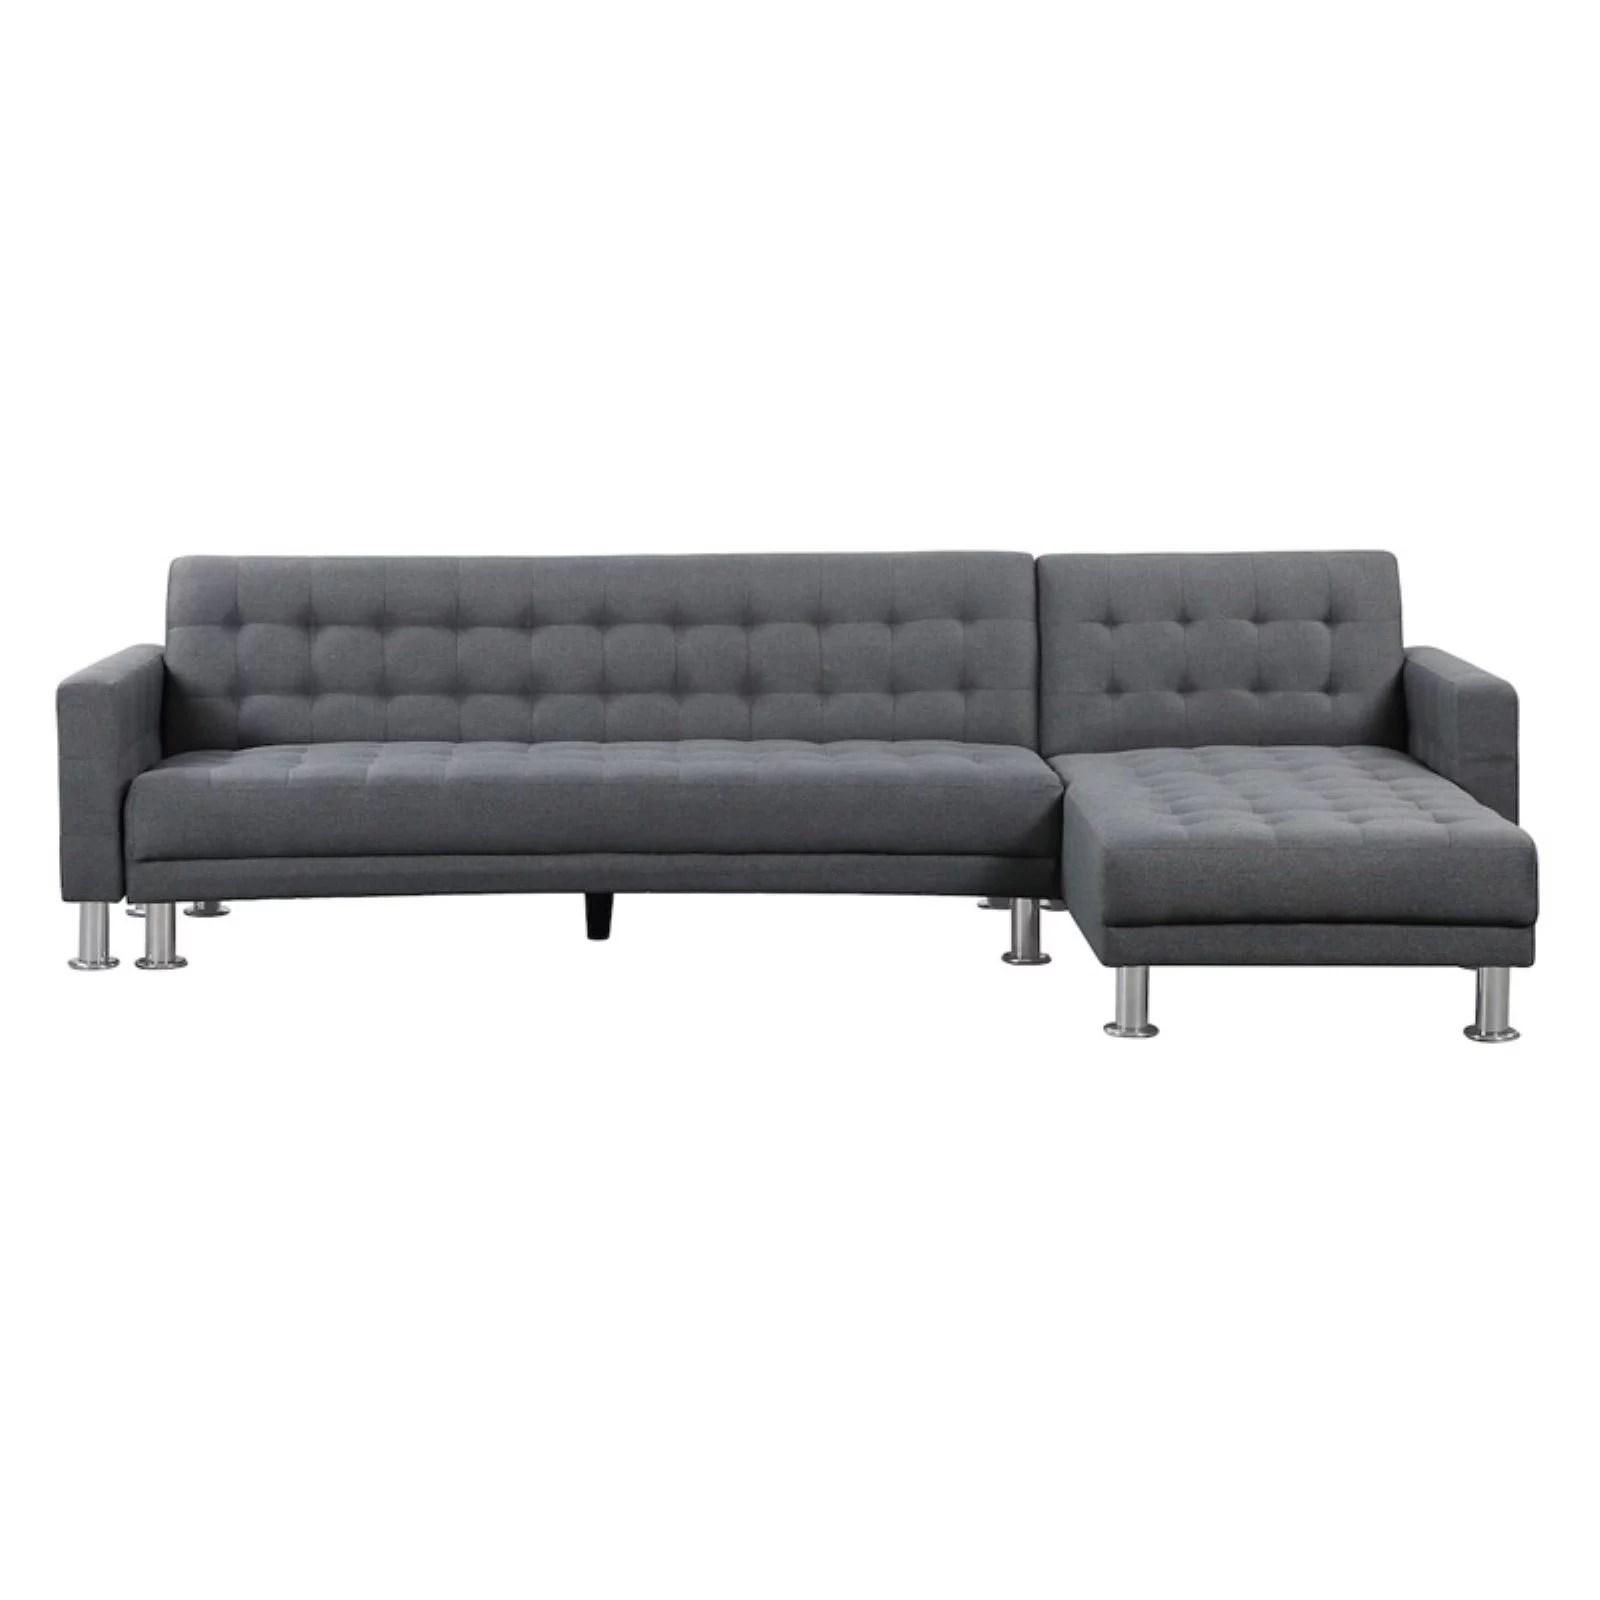 Velago Attalens Upholstered Fabric Sectional Sleeper Sofa